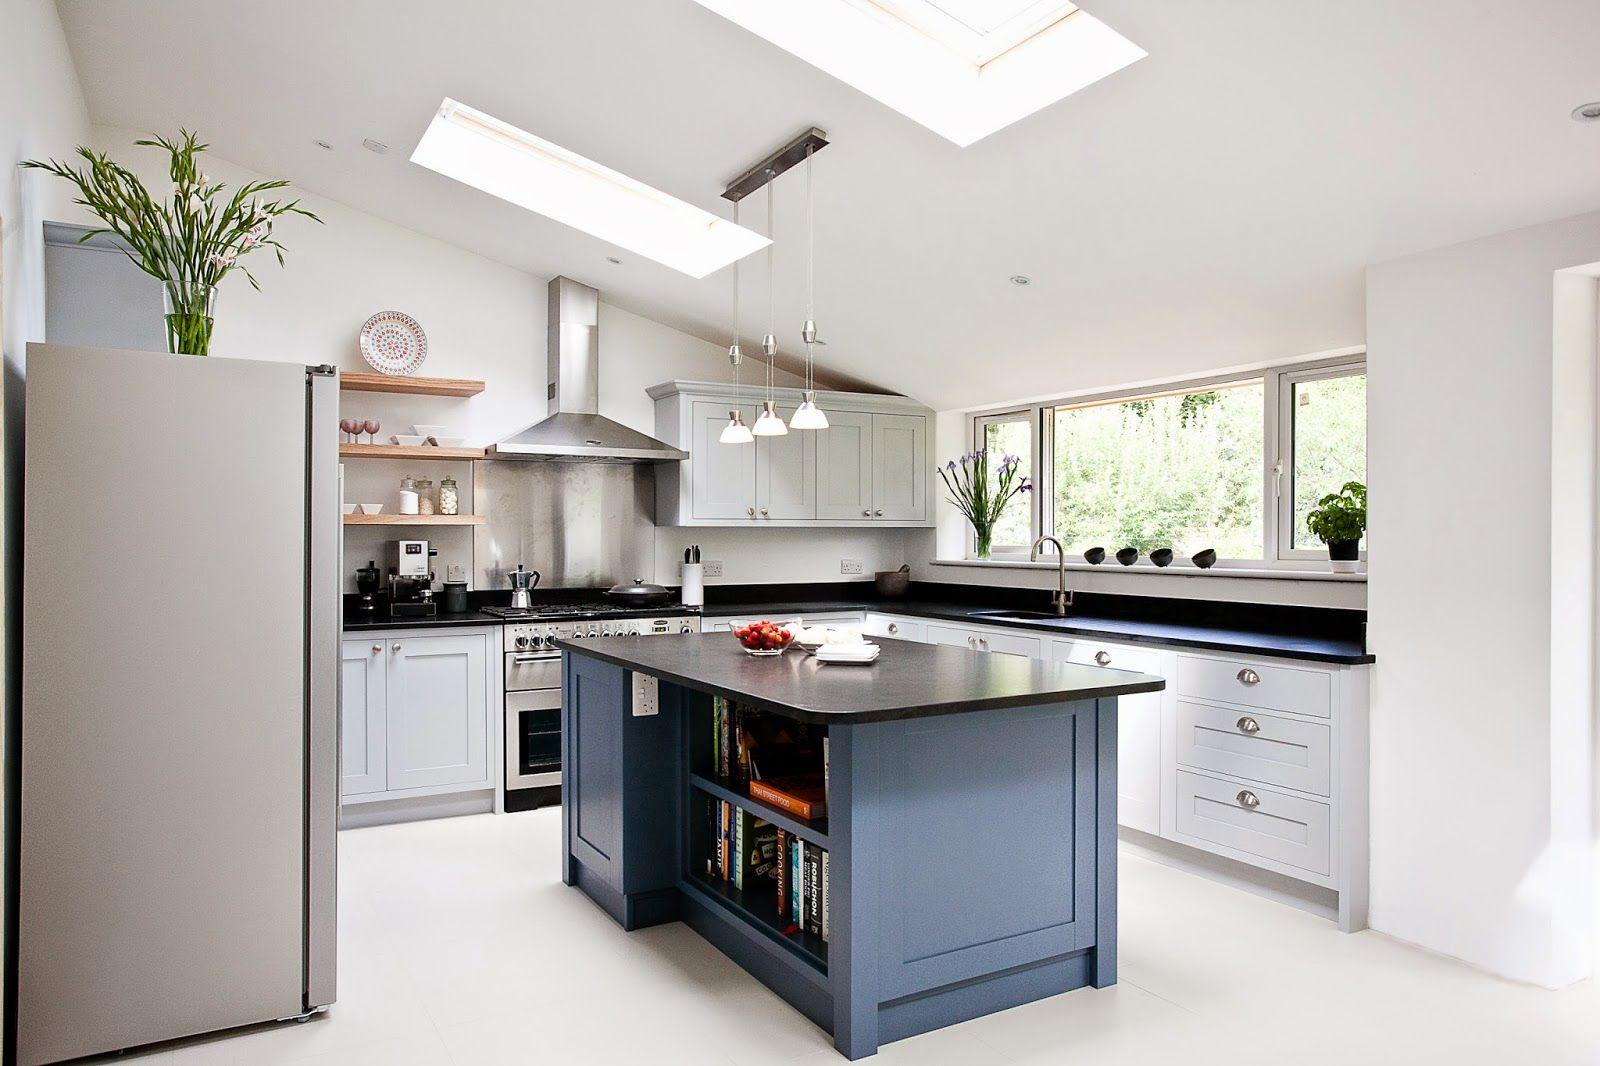 ash pinterest on cabinets cabinet images of kitchen marvellous best